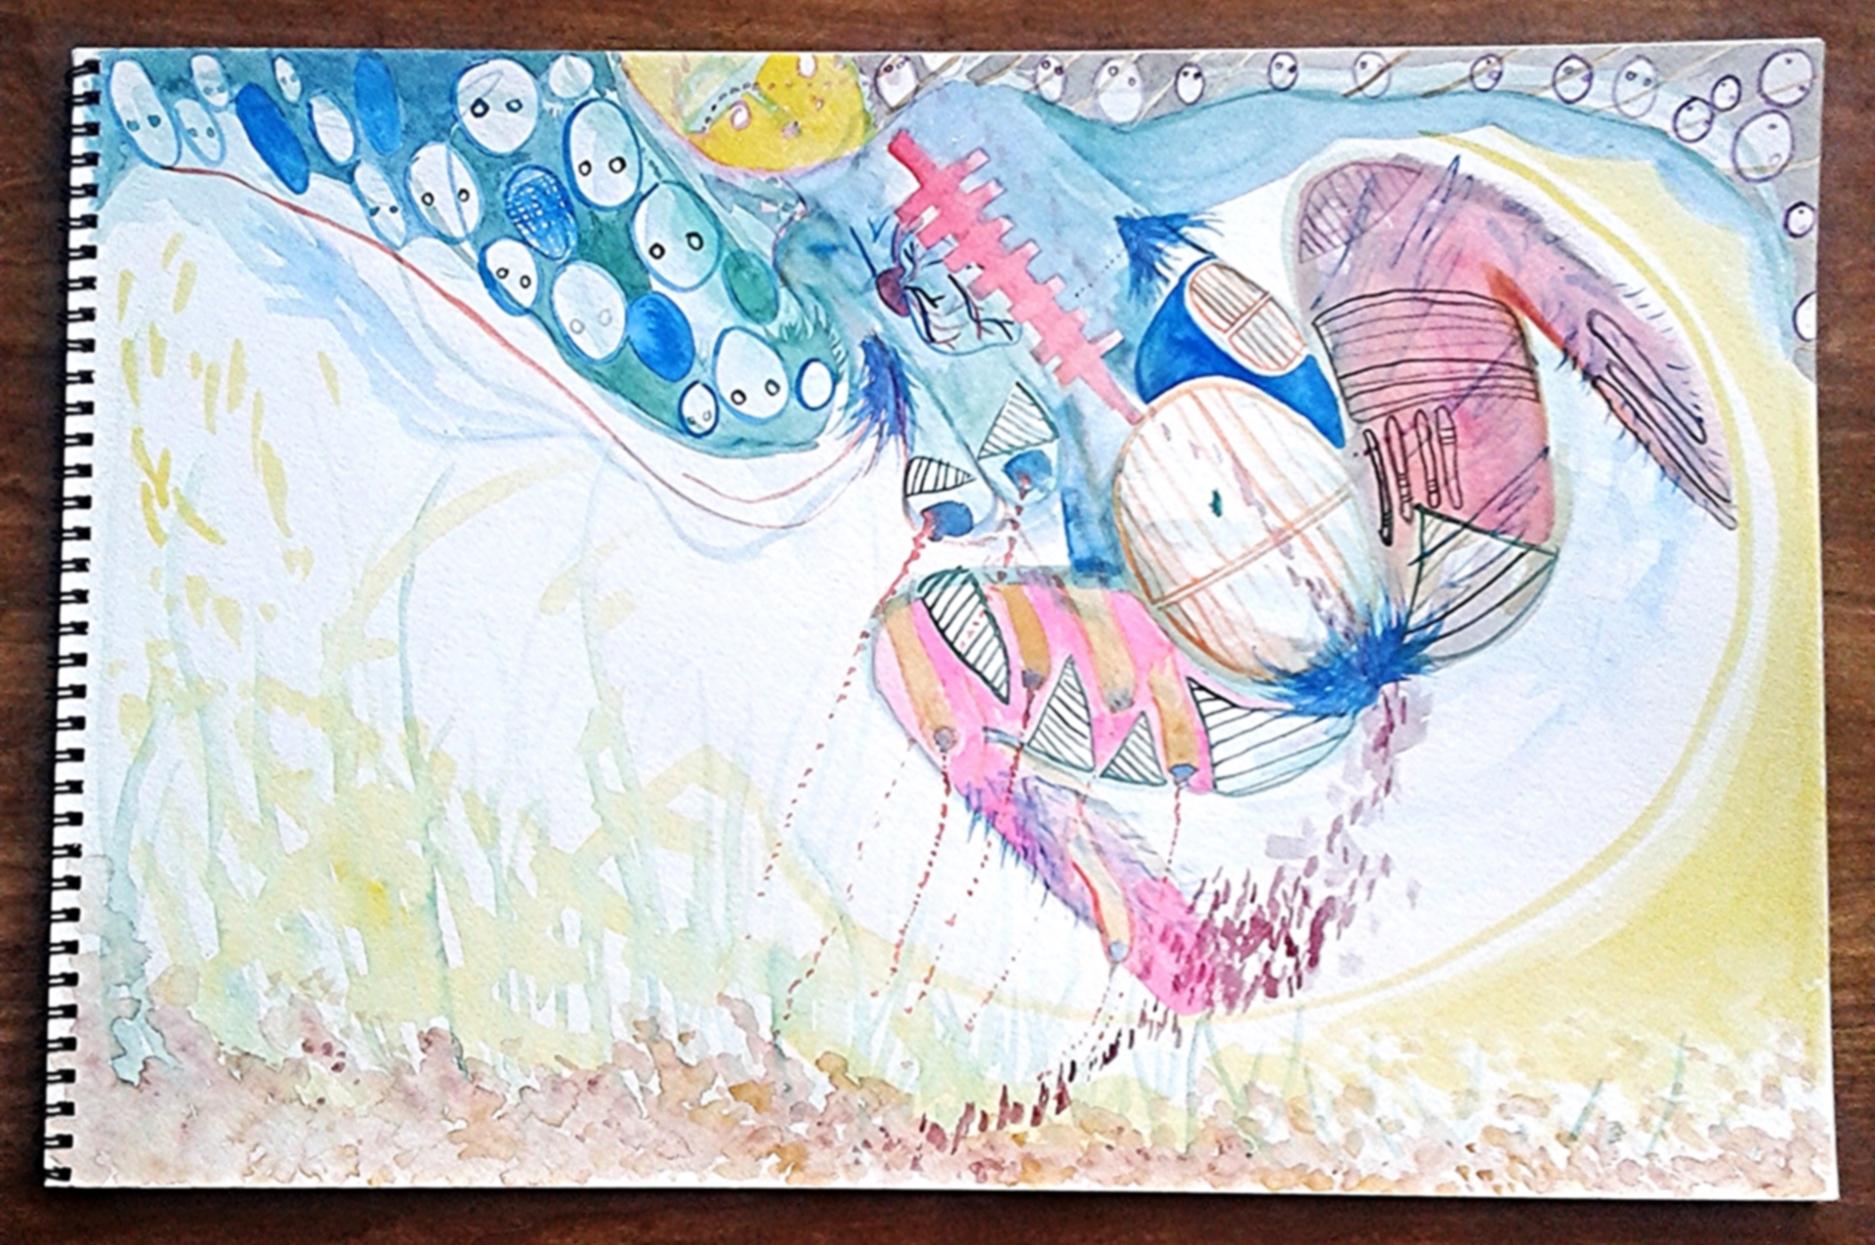 Work in progress, miscarriage art, watercolor, Fall 2014